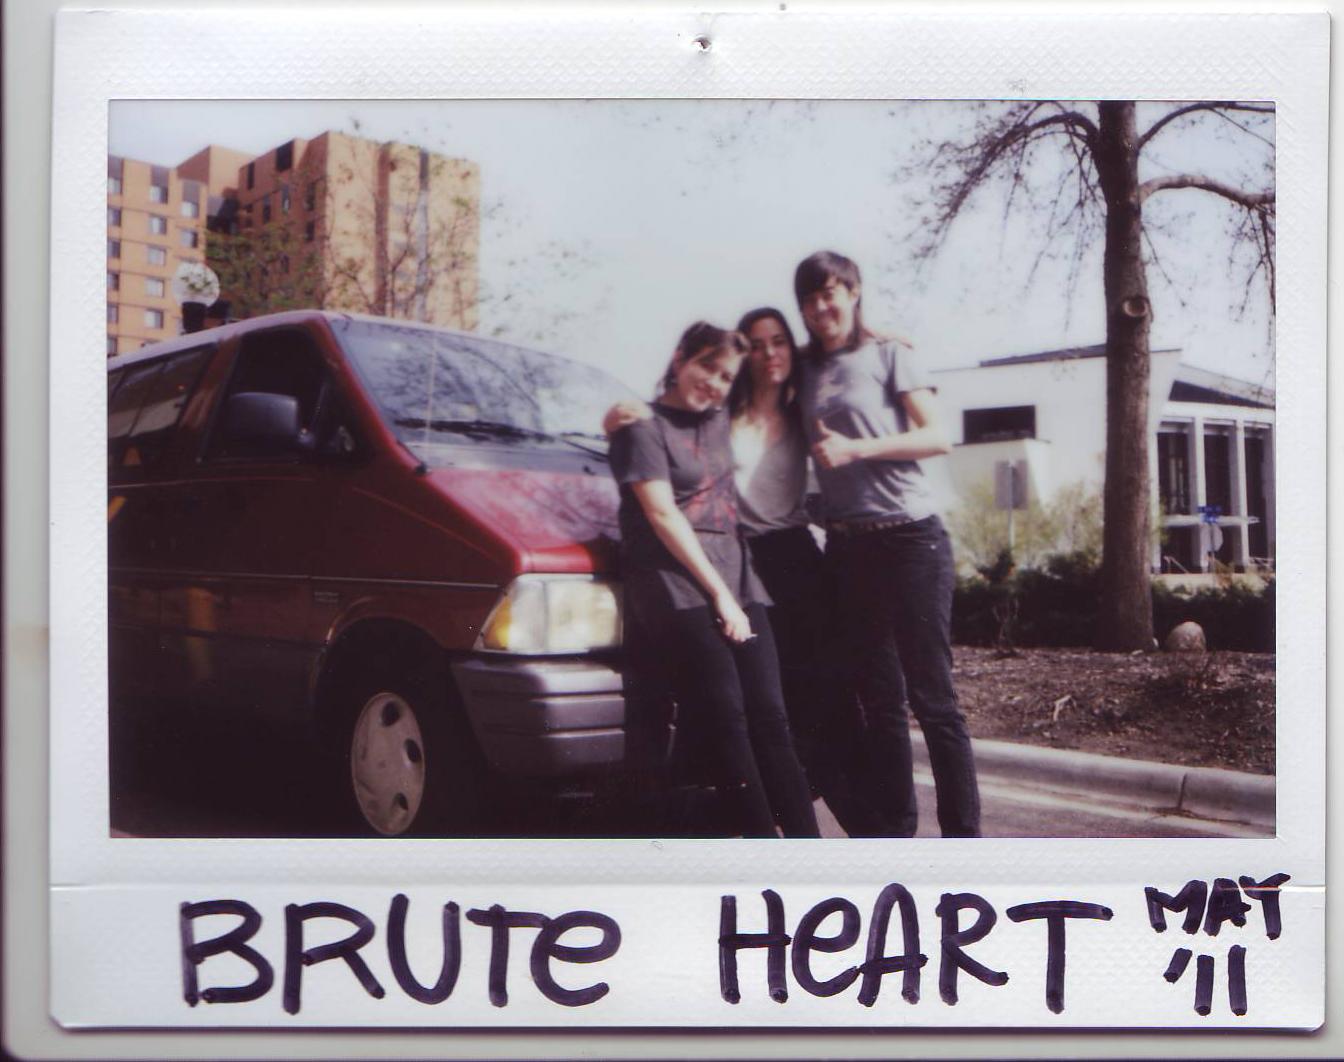 Brute Heart